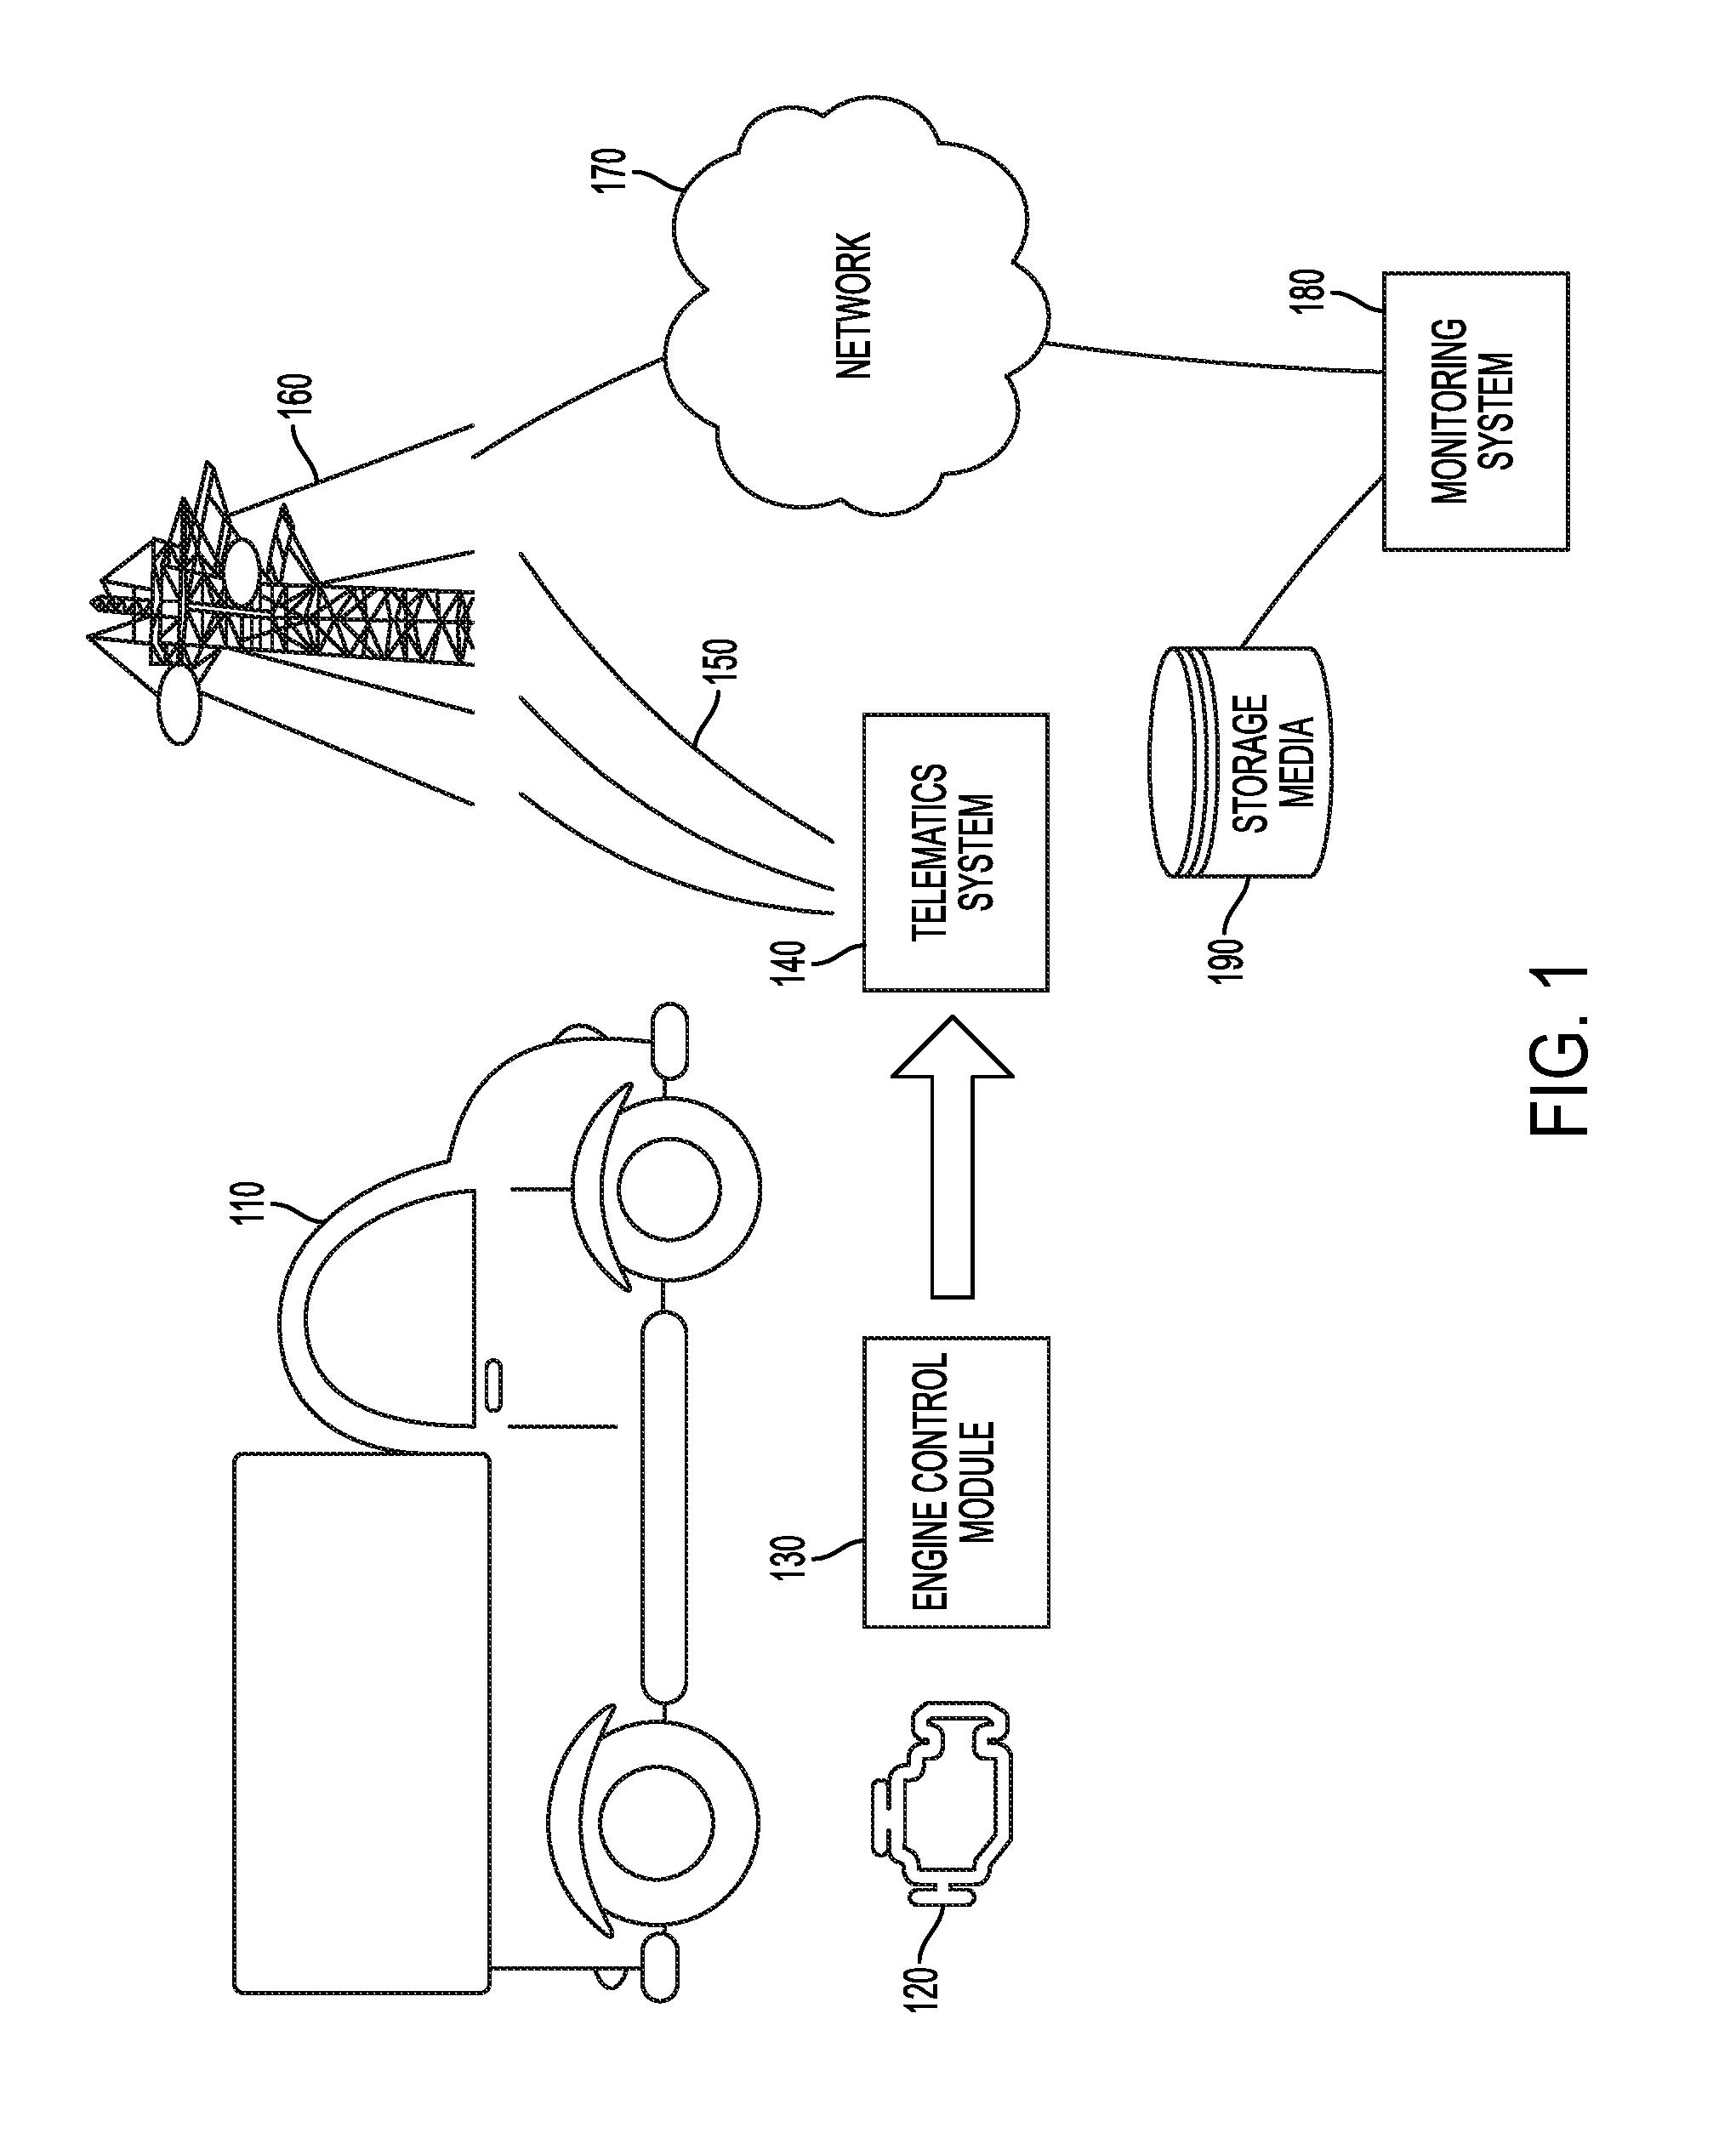 Patent US 9,811,951 B2